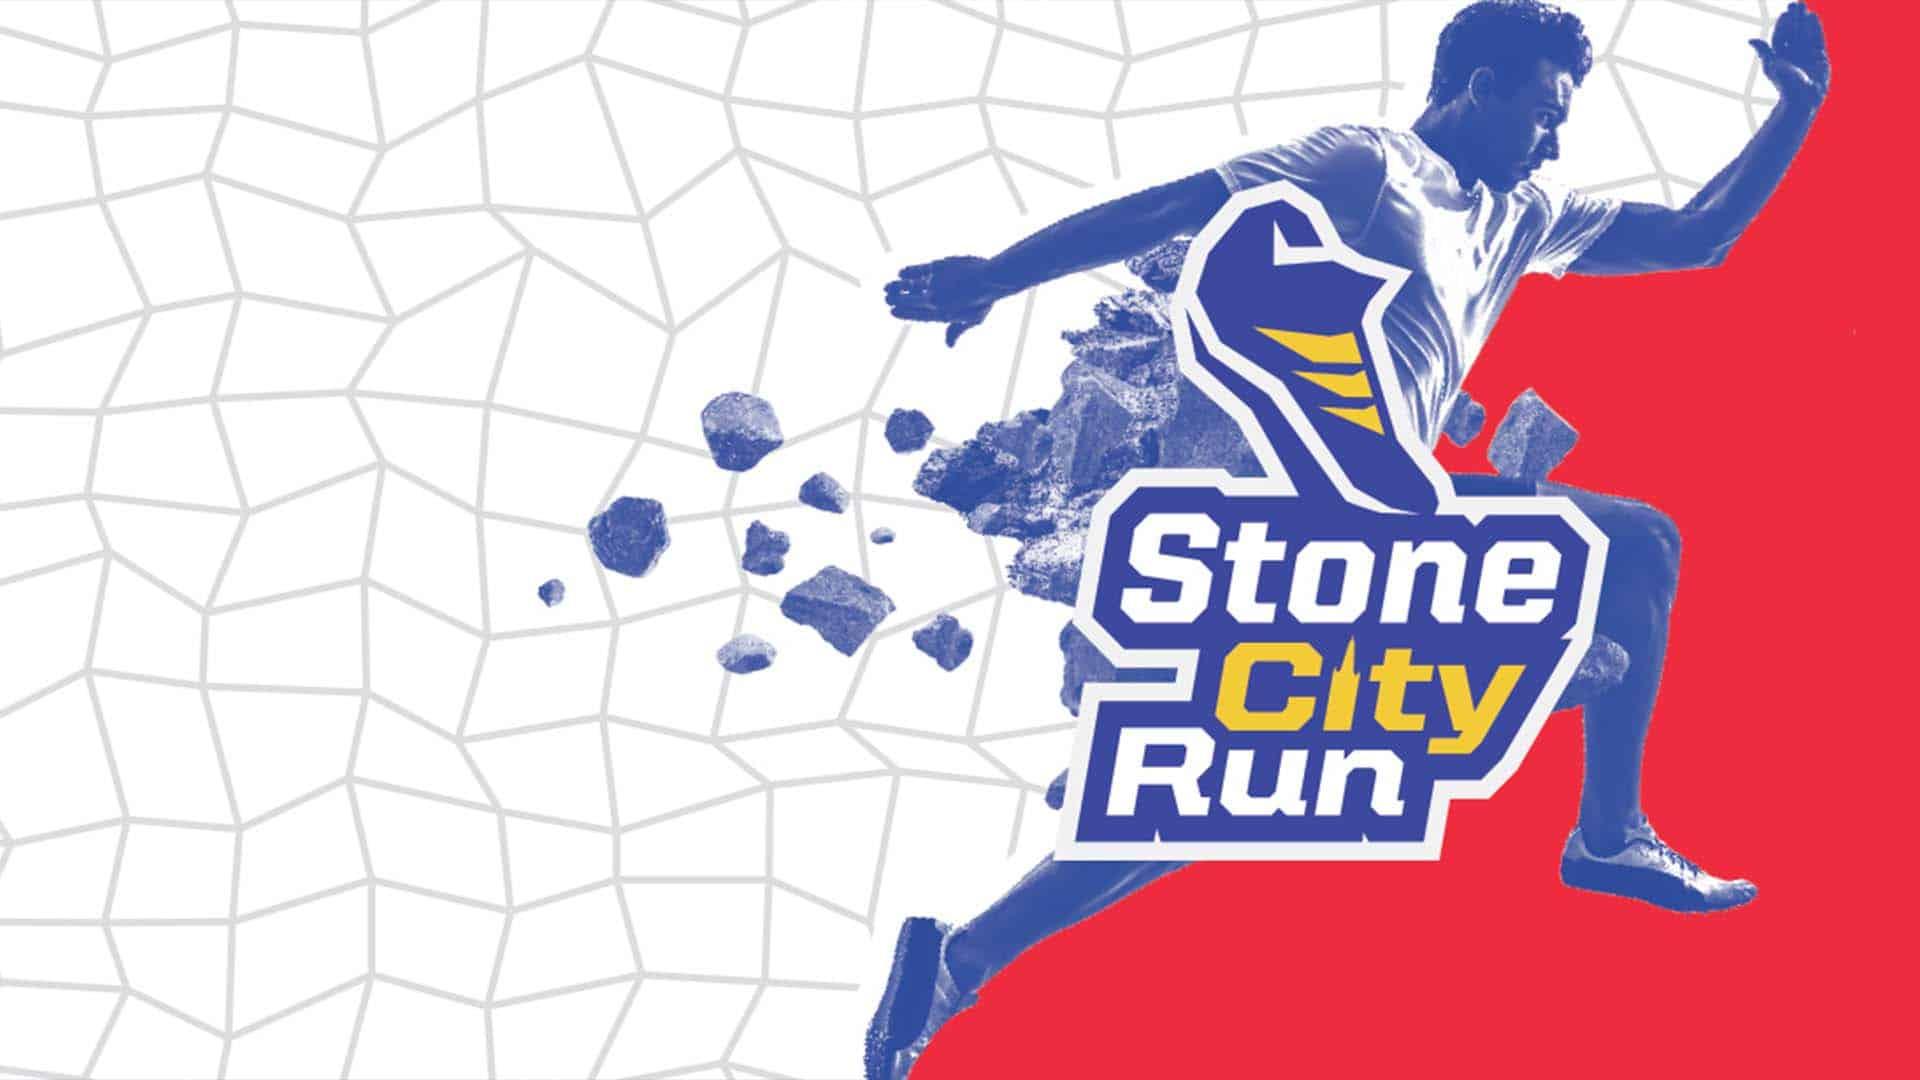 stone-city-run